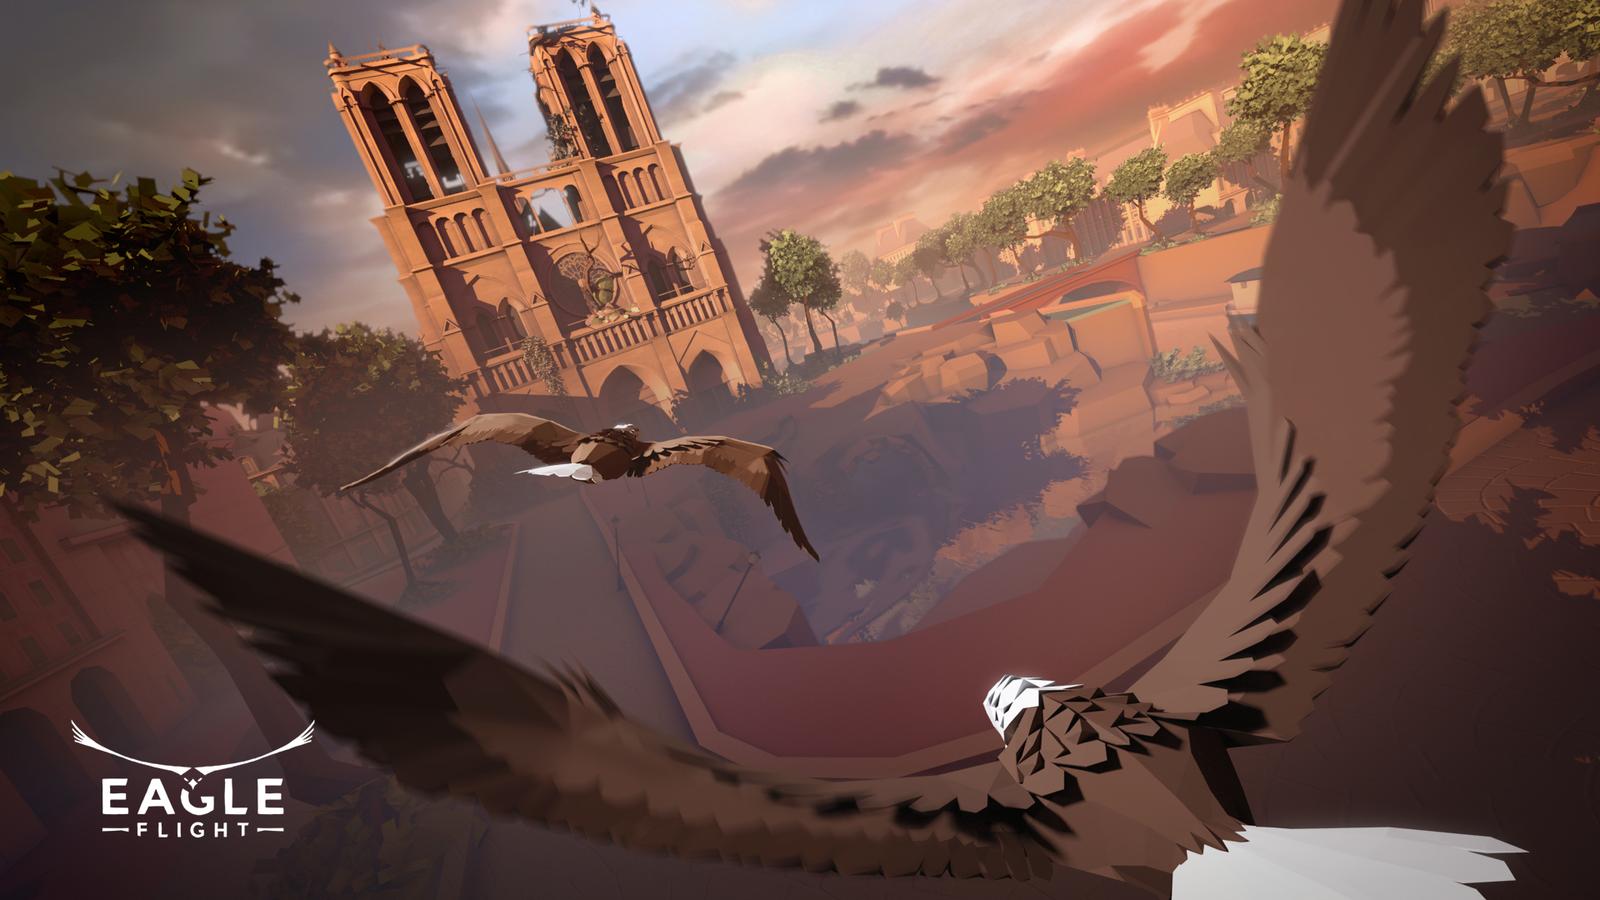 Eagle_Flight_screenshots_0440_01.0.0